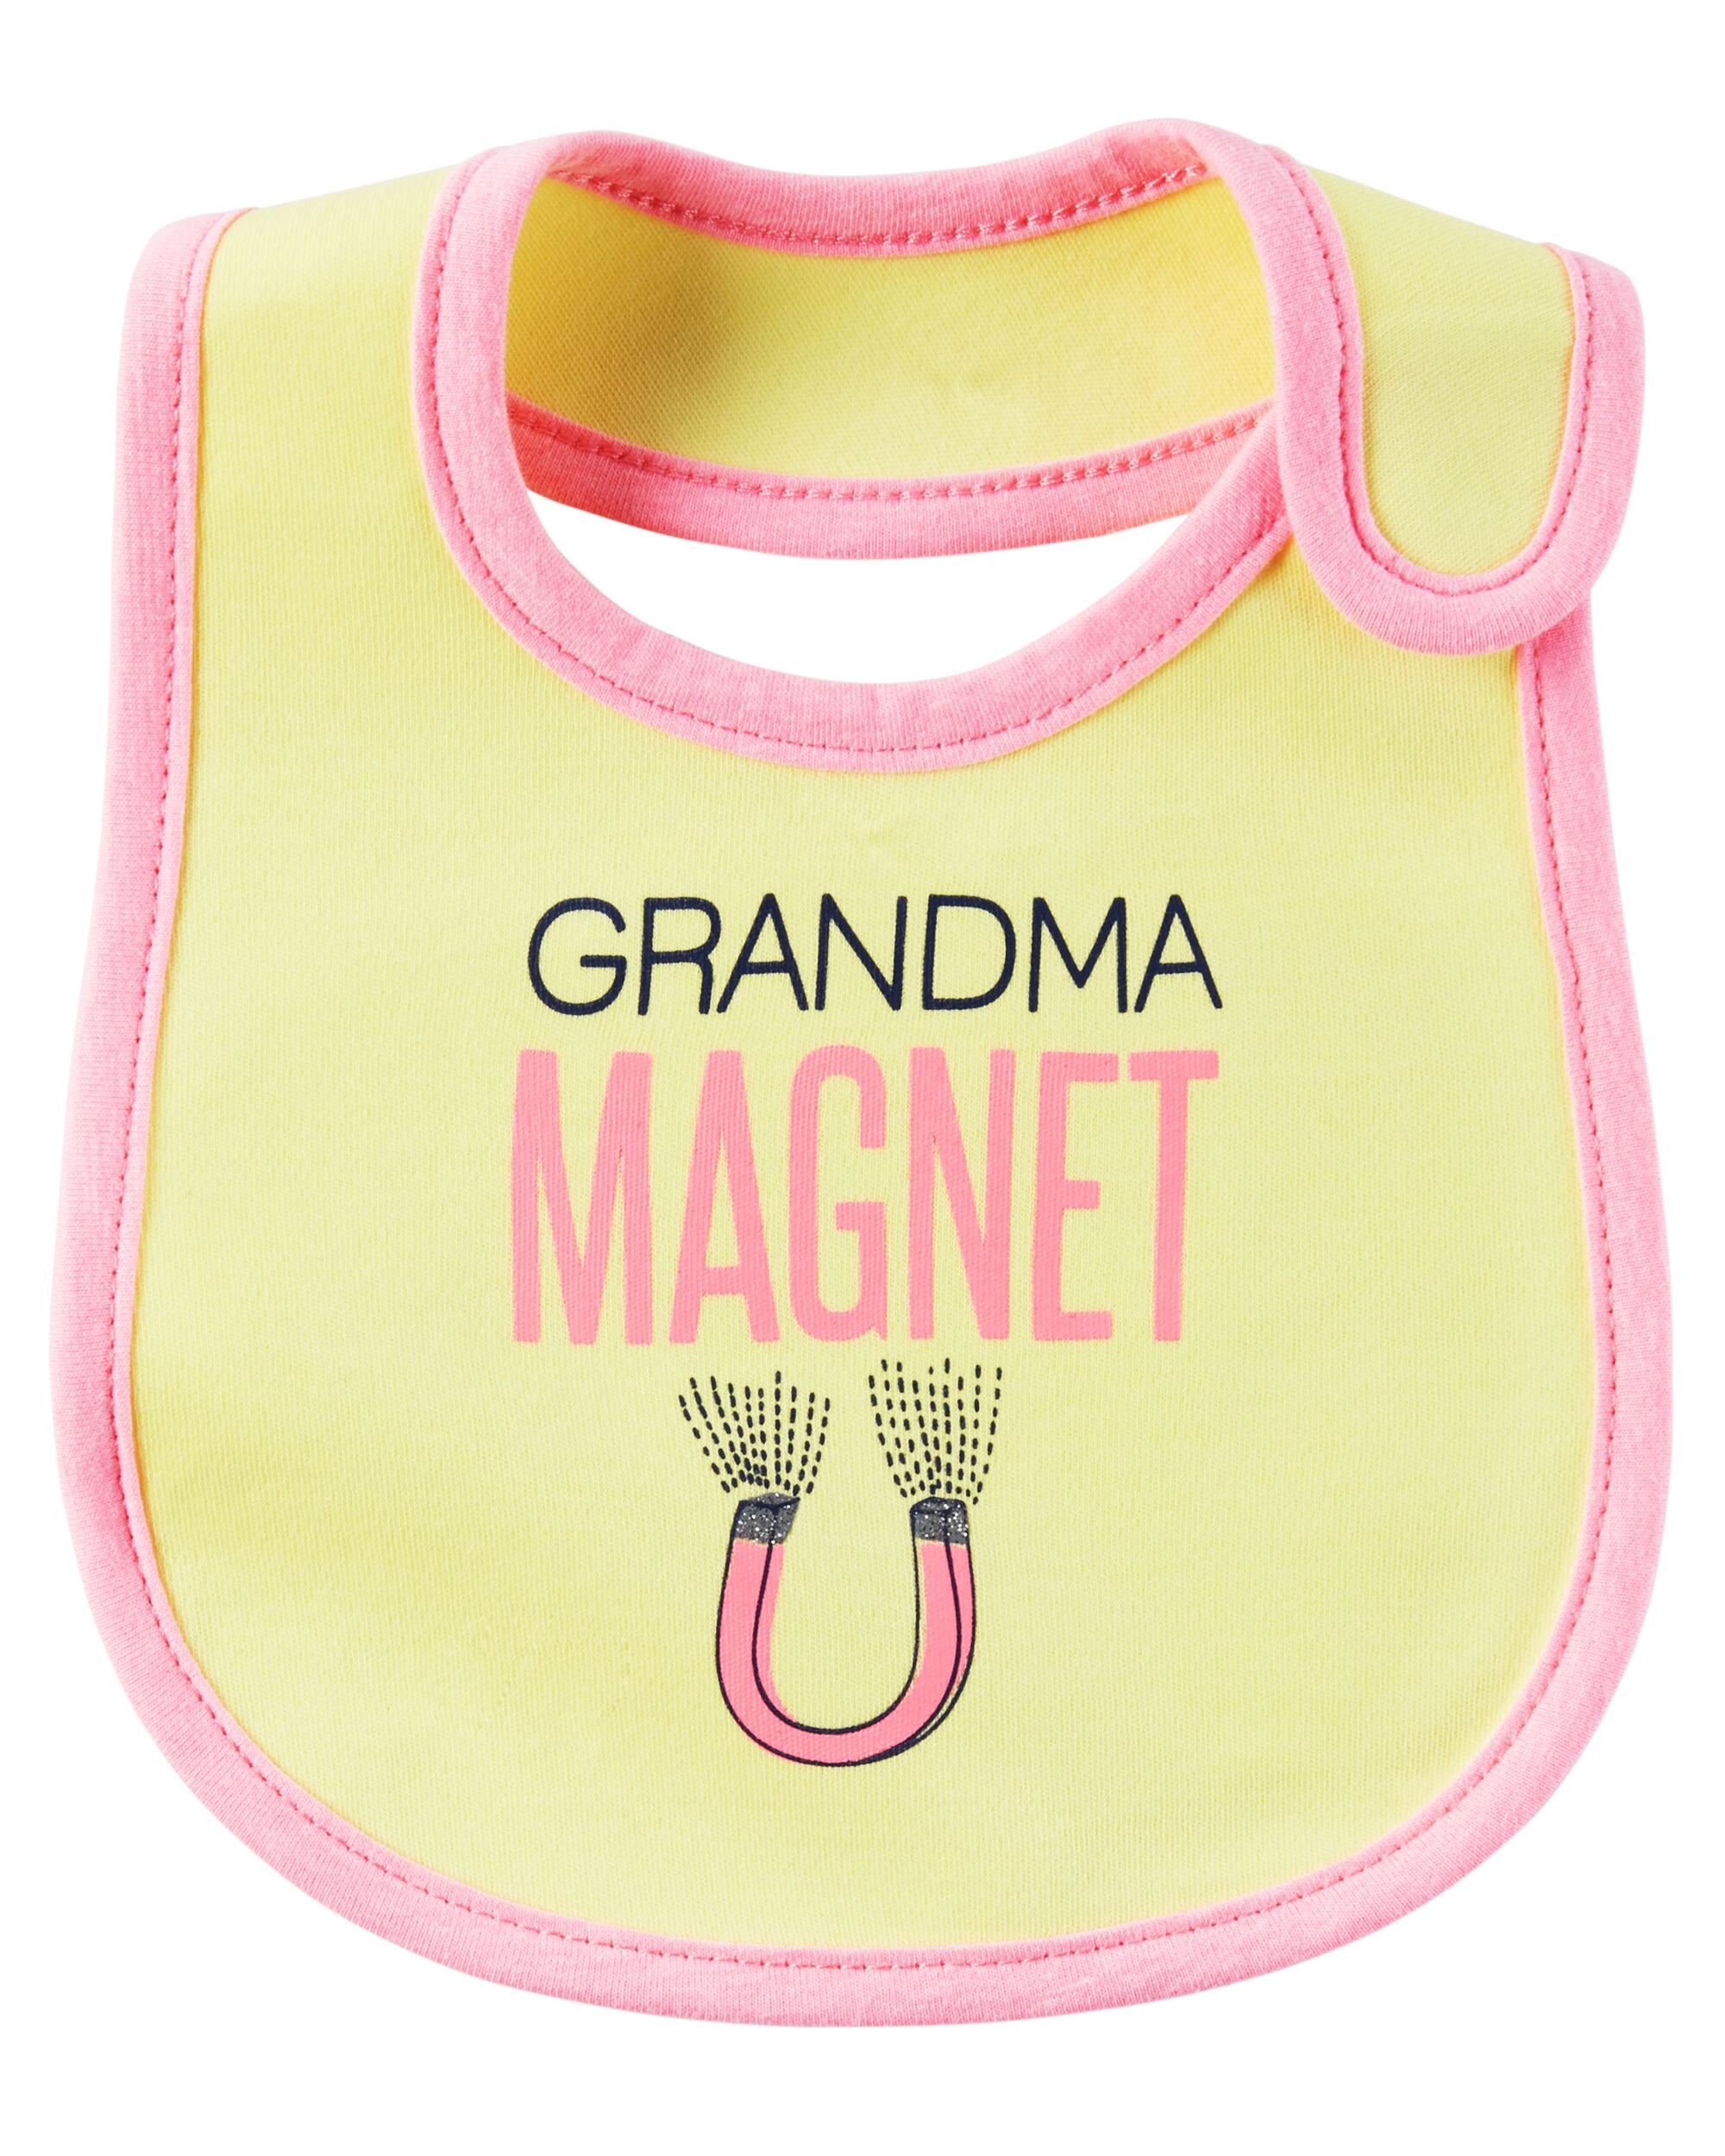 grandma magnet teething bib carters com